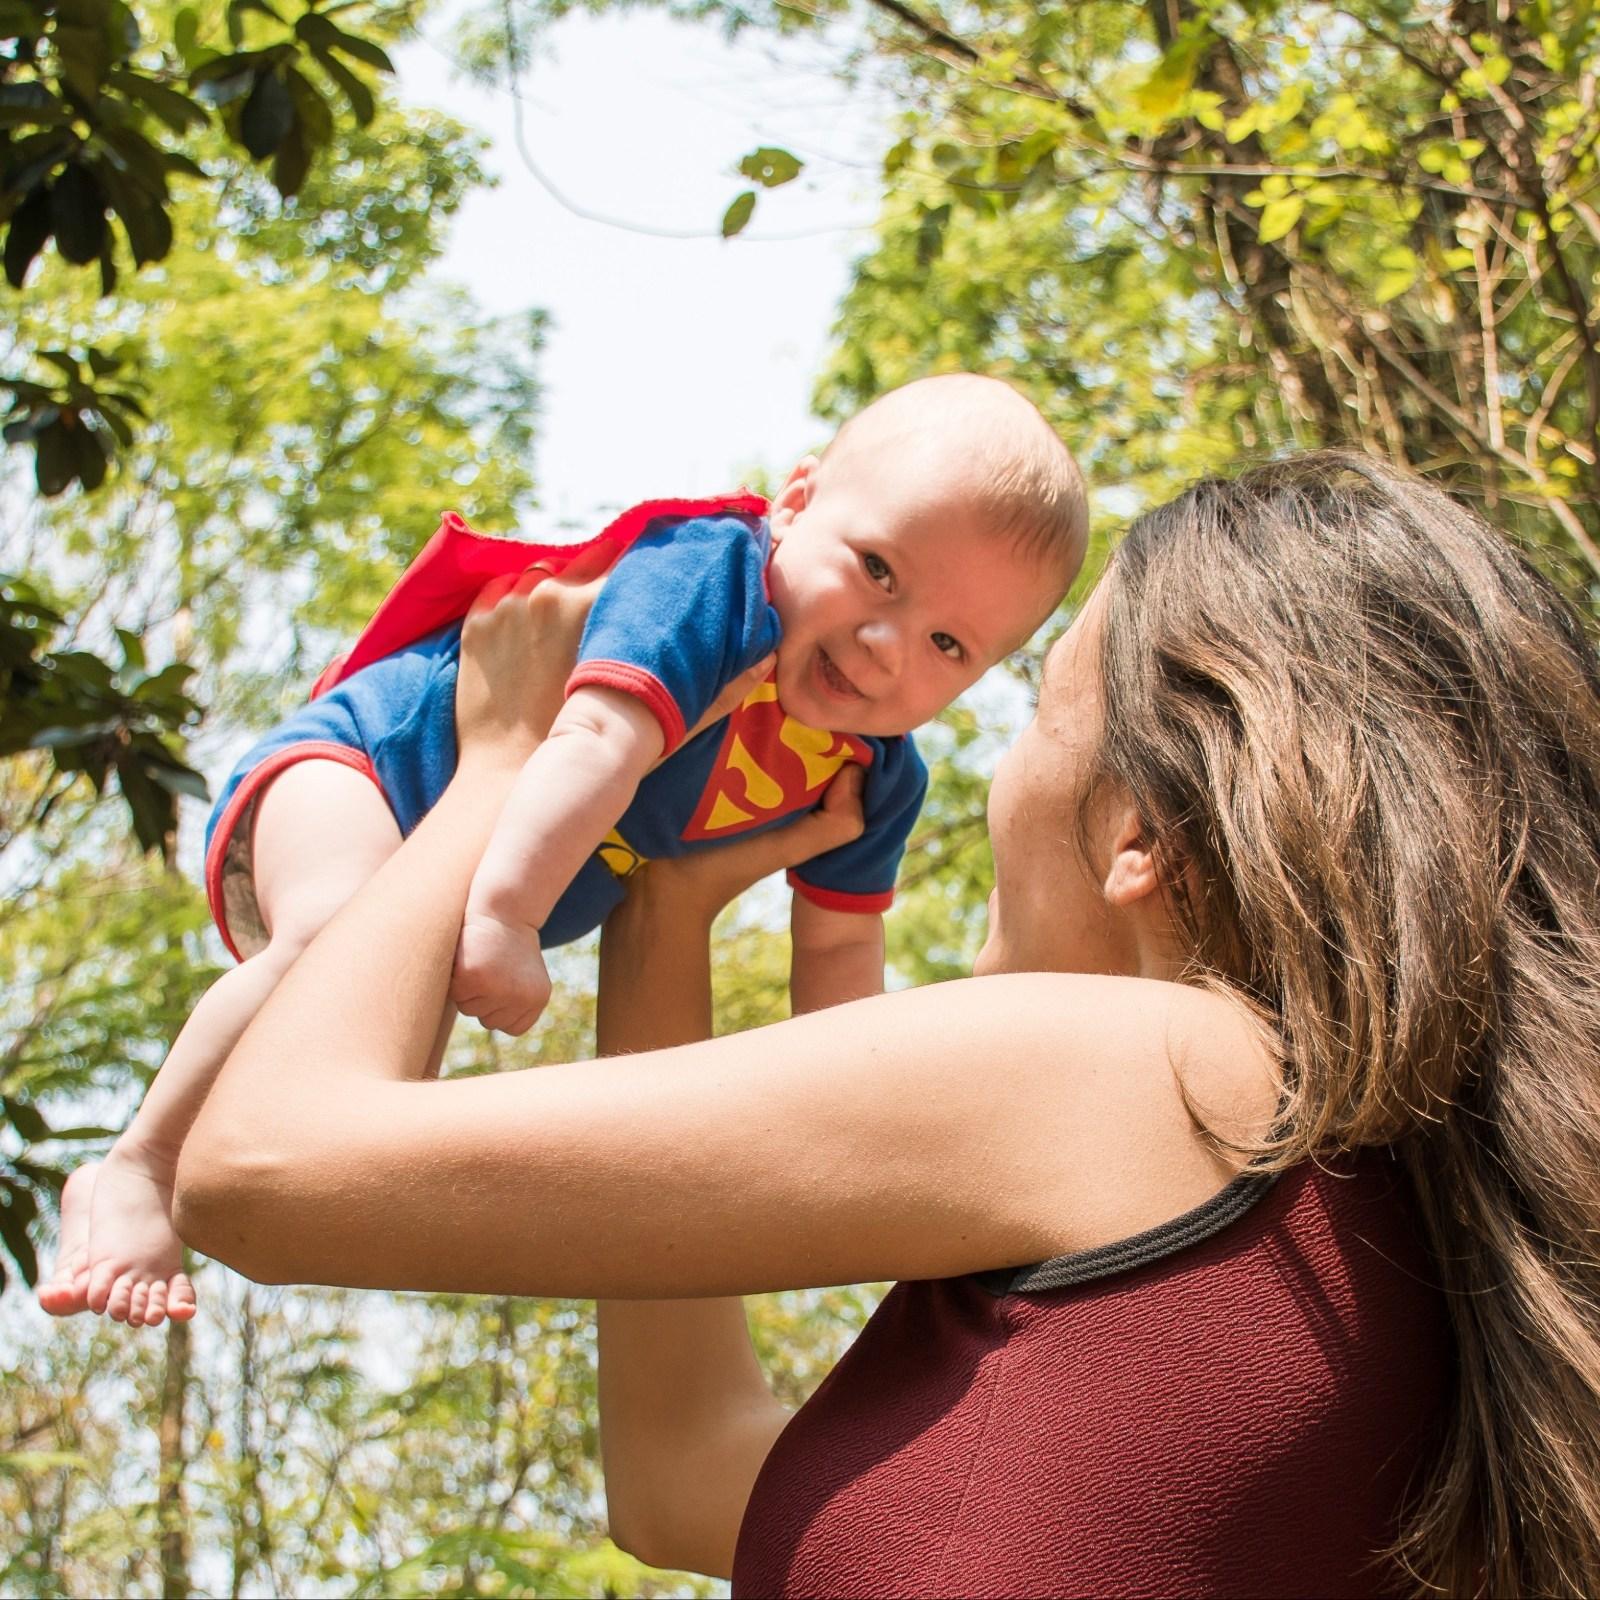 ChildFeeding.org | Collaboration